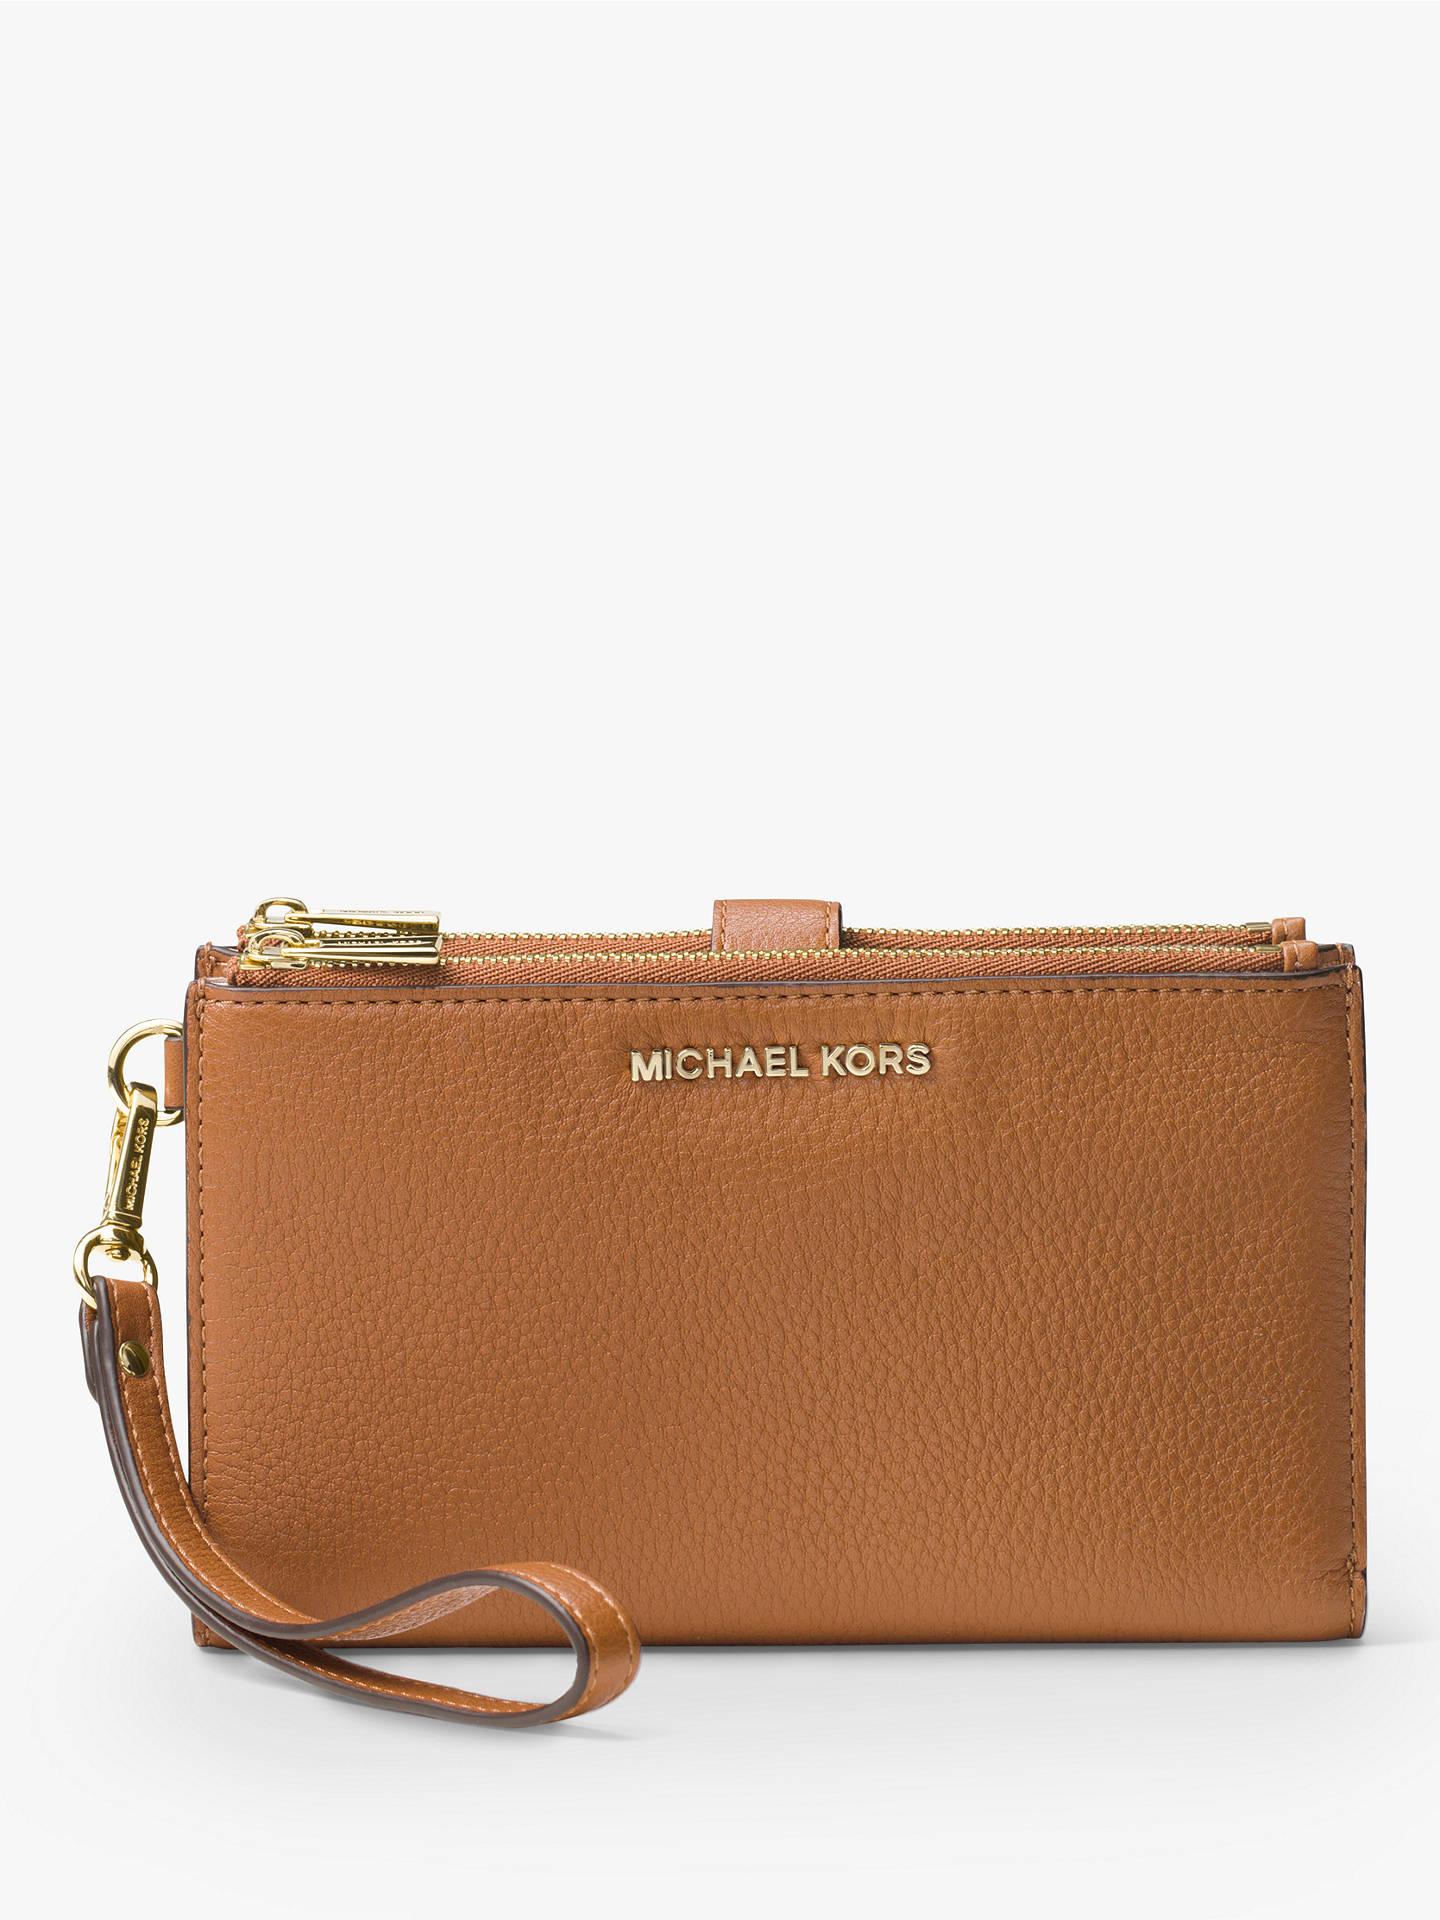 9724704993b7 Buy MICHAEL Michael Kors Adele Leather Smartphone Wallet, Acorn Online at  johnlewis.com ...